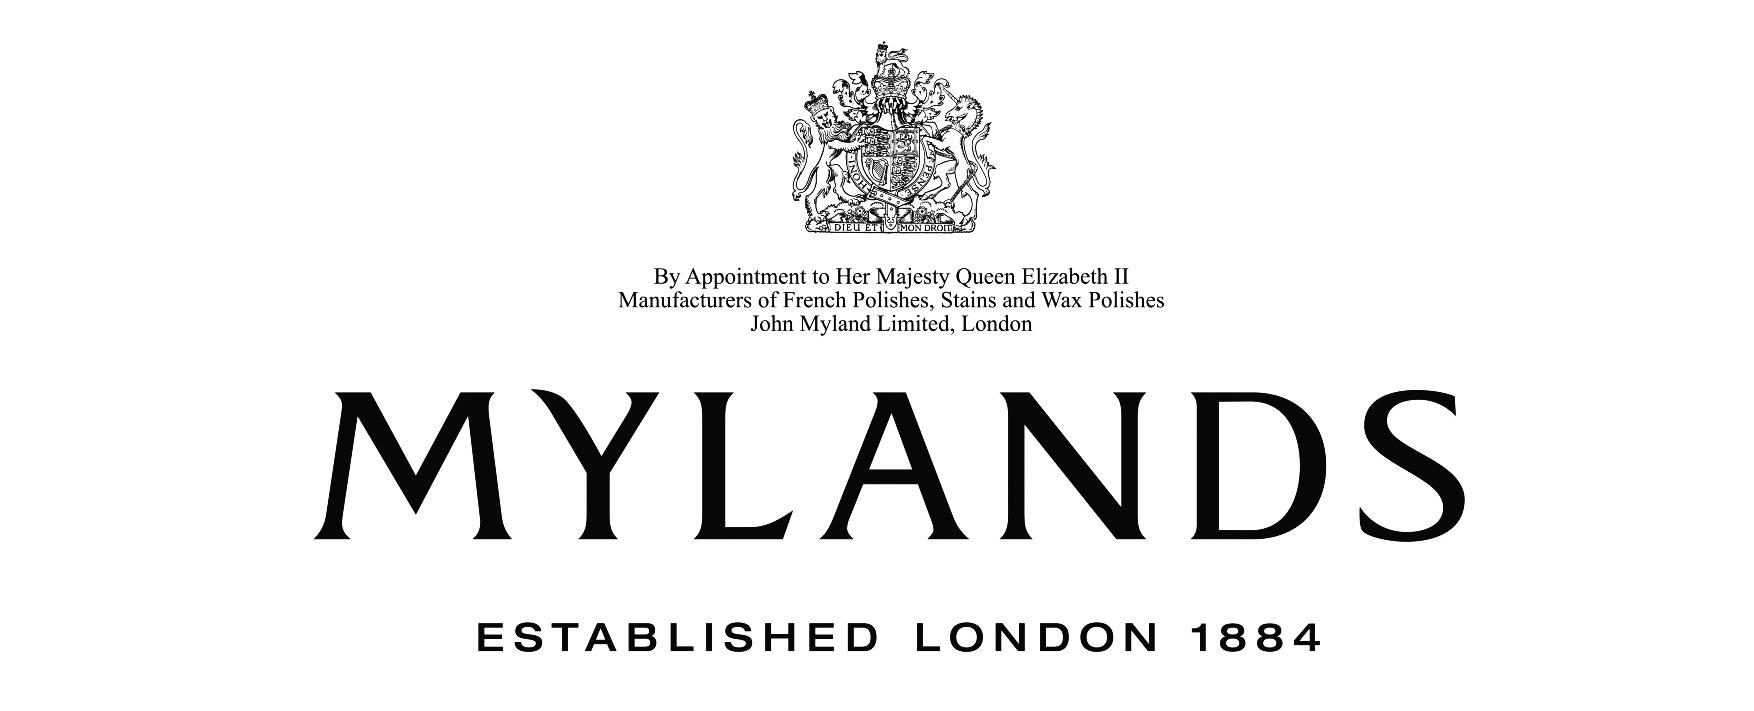 NEW_Mylands_Logo_Black 2.jpg